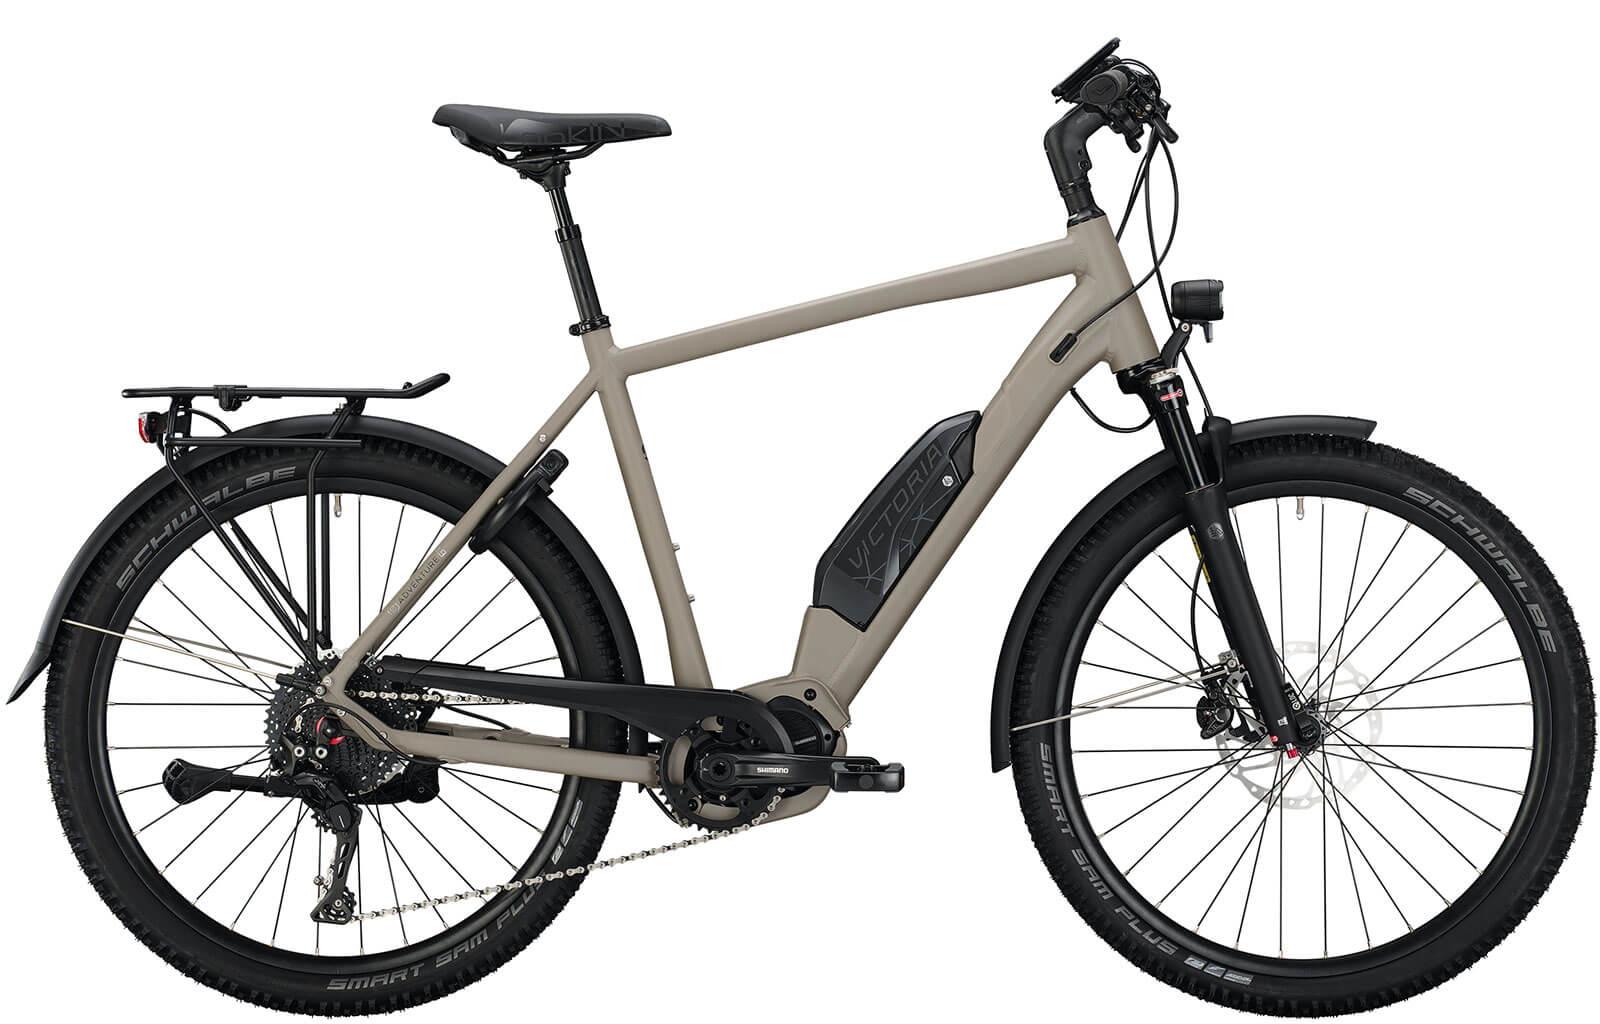 victoria 8 9 e bike eadventure shimano steps modelj 2020 delta bikes. Black Bedroom Furniture Sets. Home Design Ideas